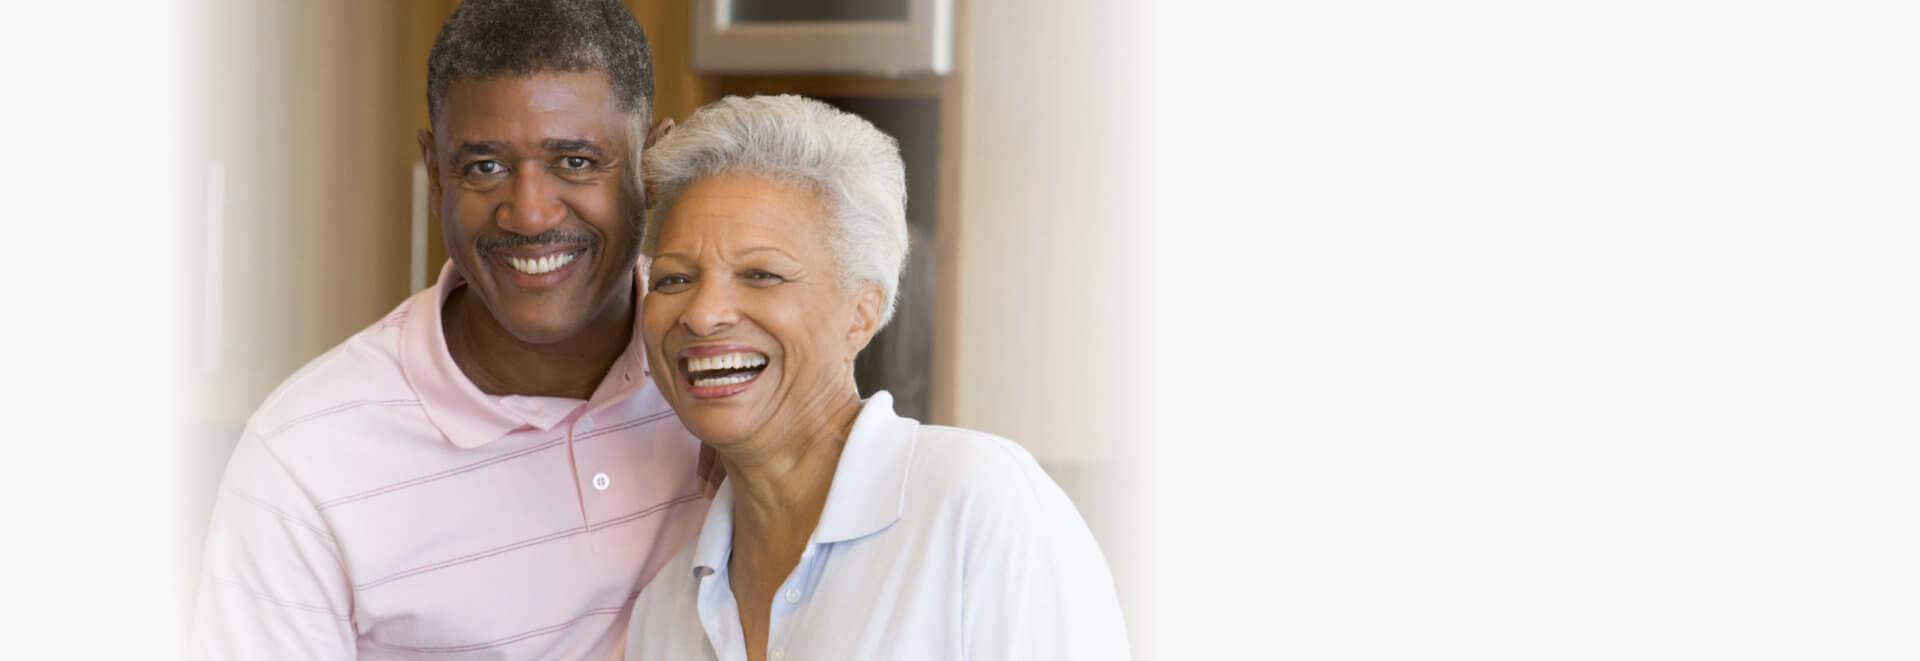 elderly couple happy together